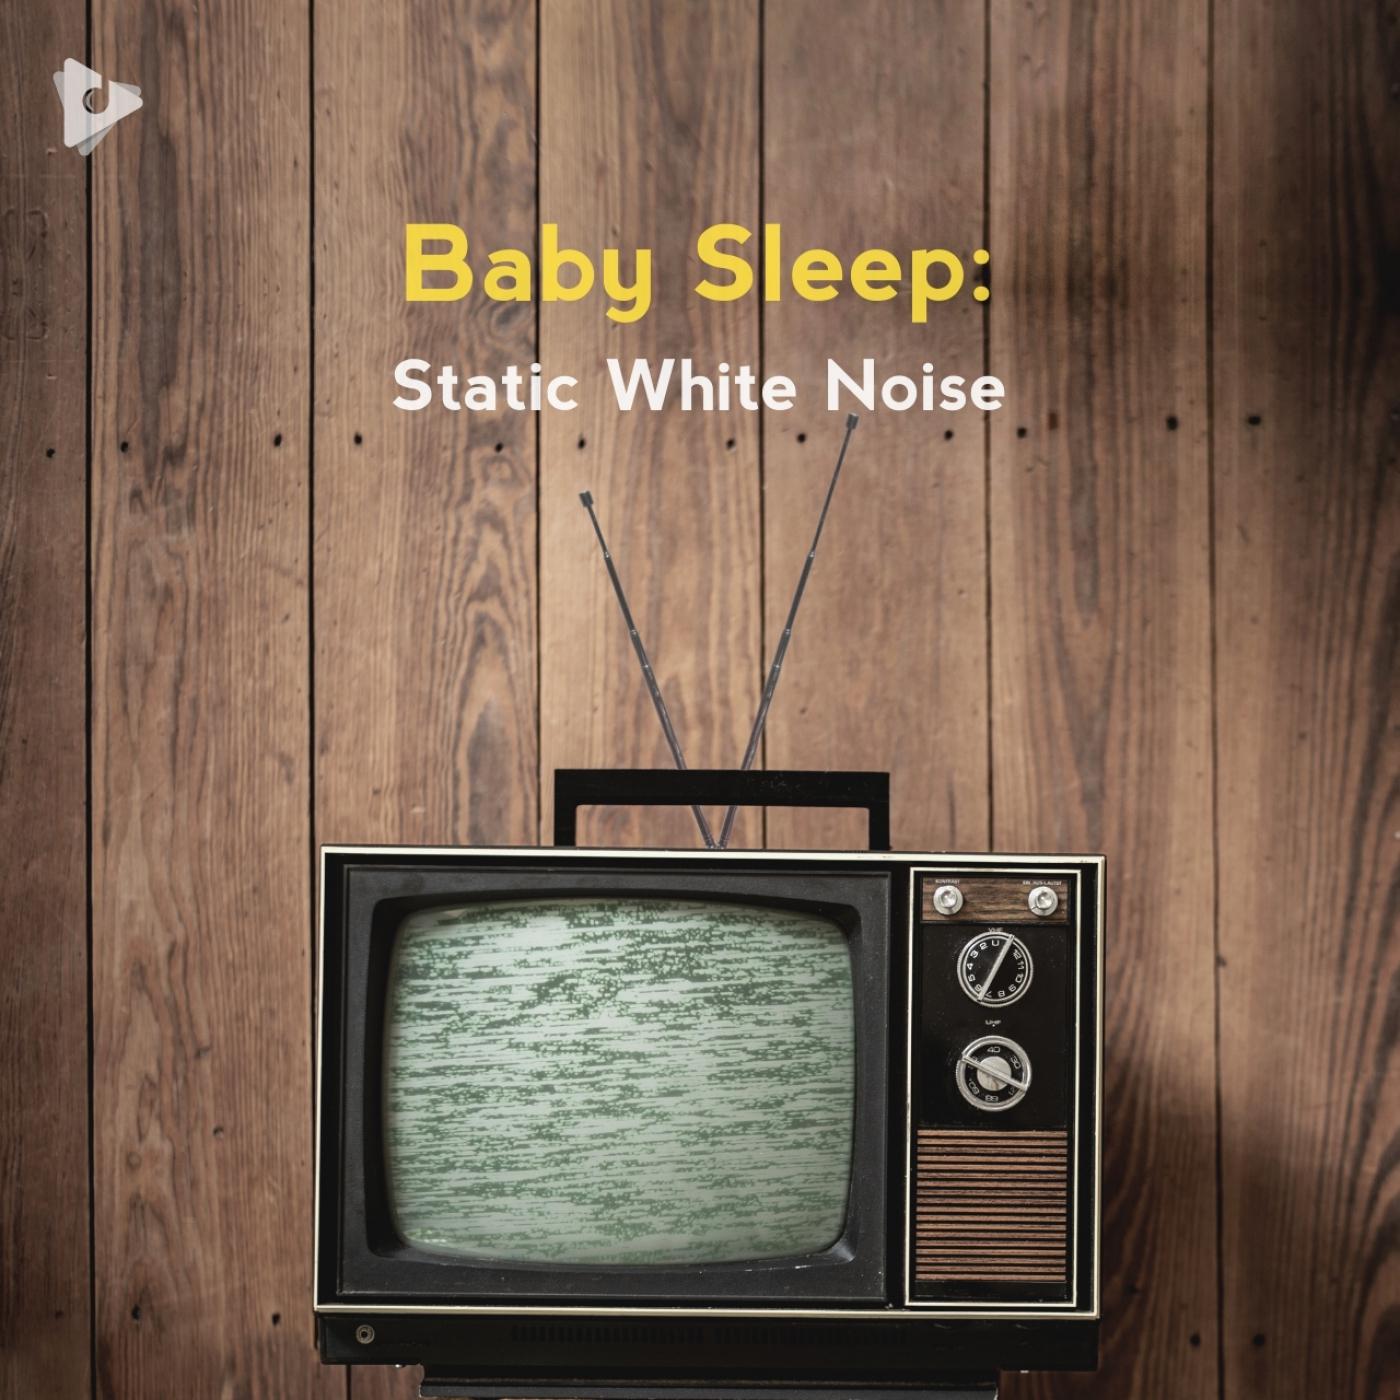 Baby Sleep: Static White Noise